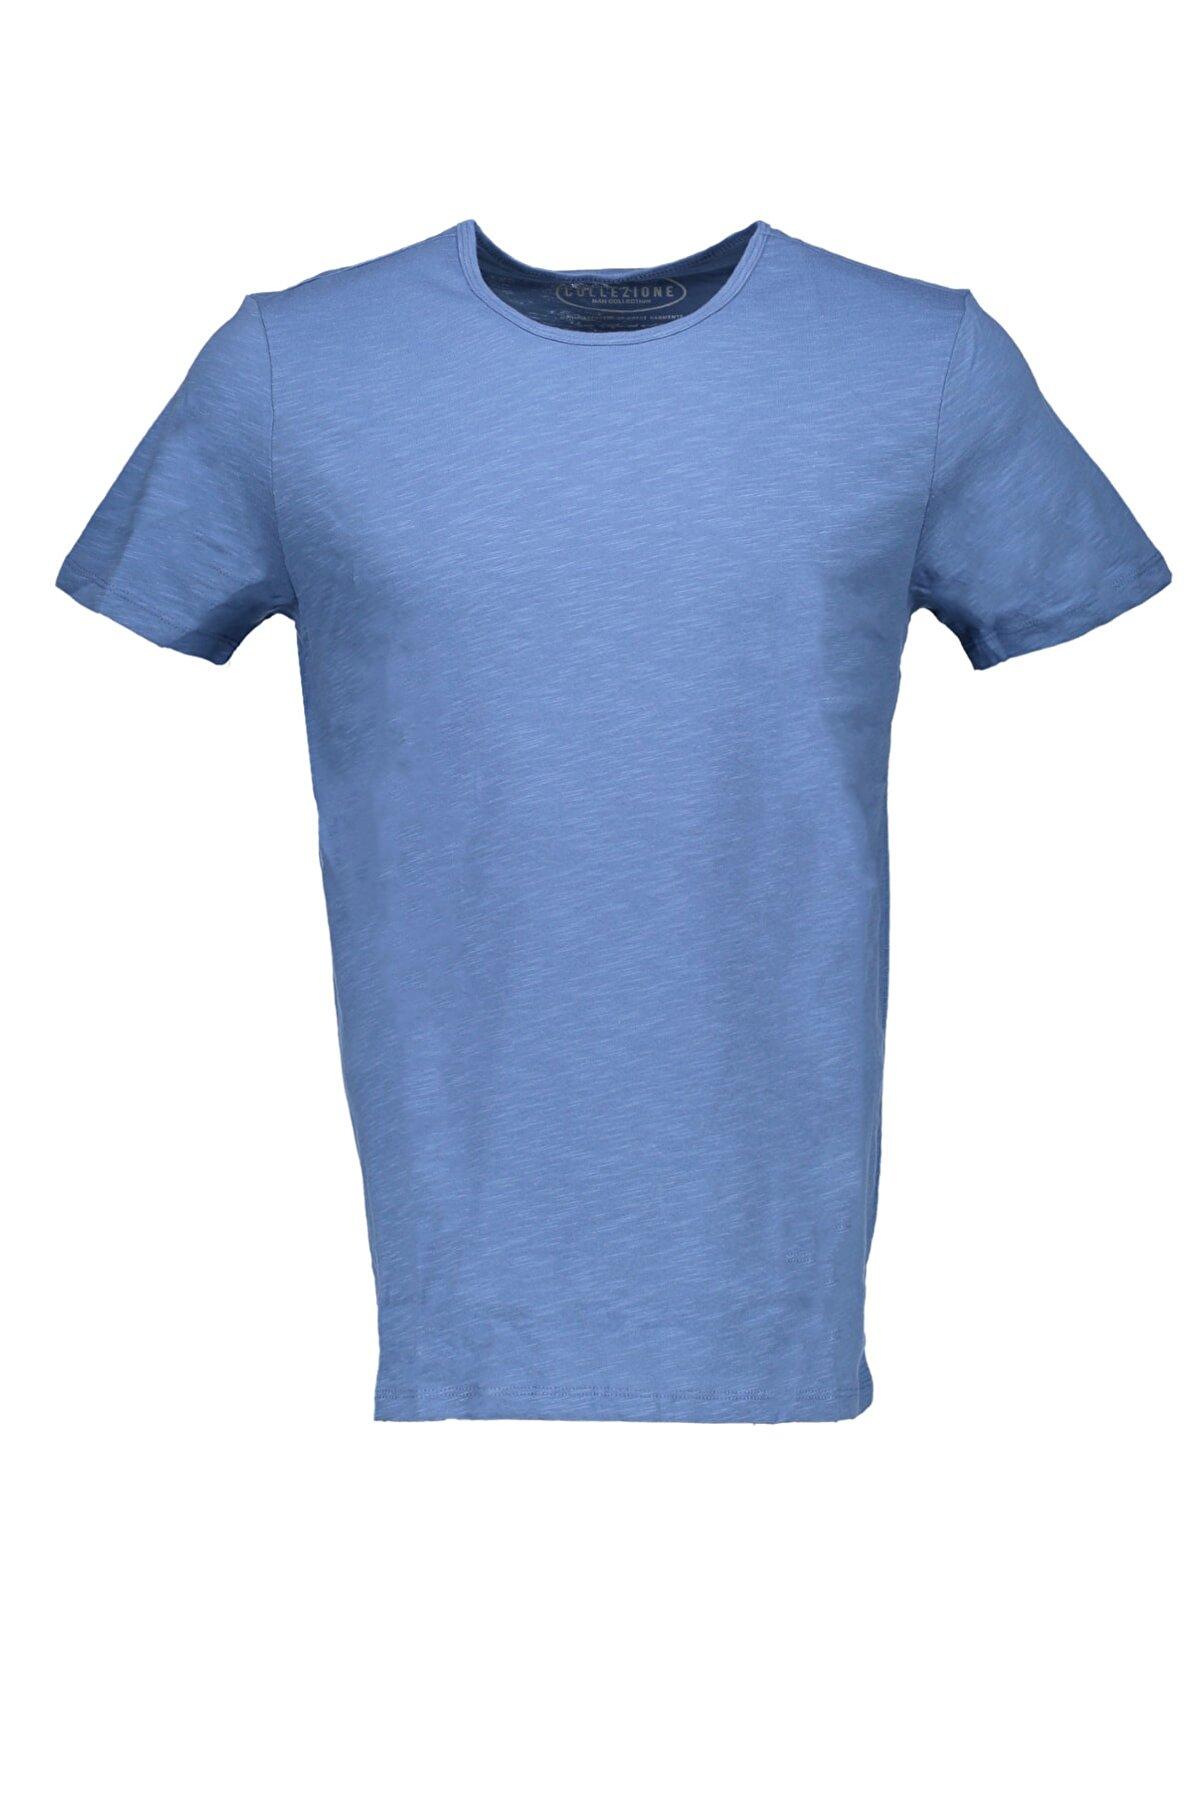 Collezione Indigo Erkek Somon Spor Regular Kısa Kol T-shirt